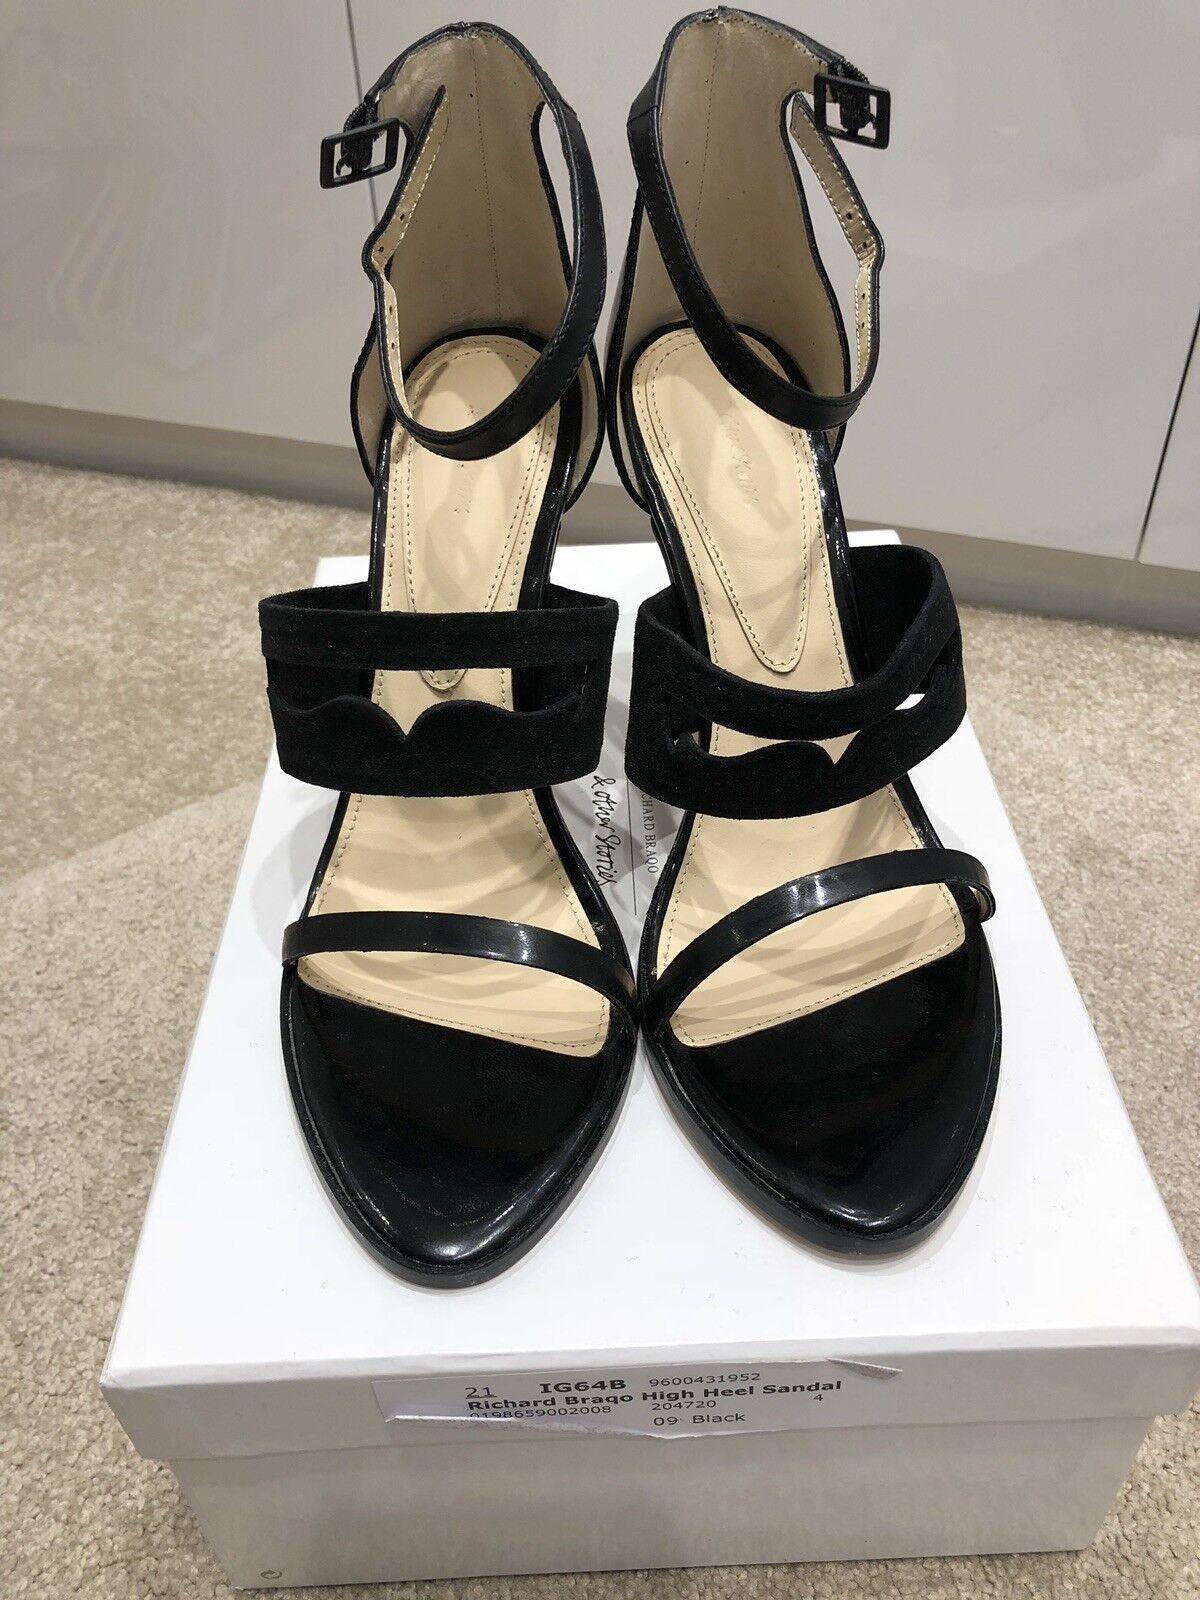 Other Stories Richard Braqo High Heeled Black Leather Sandal(39)